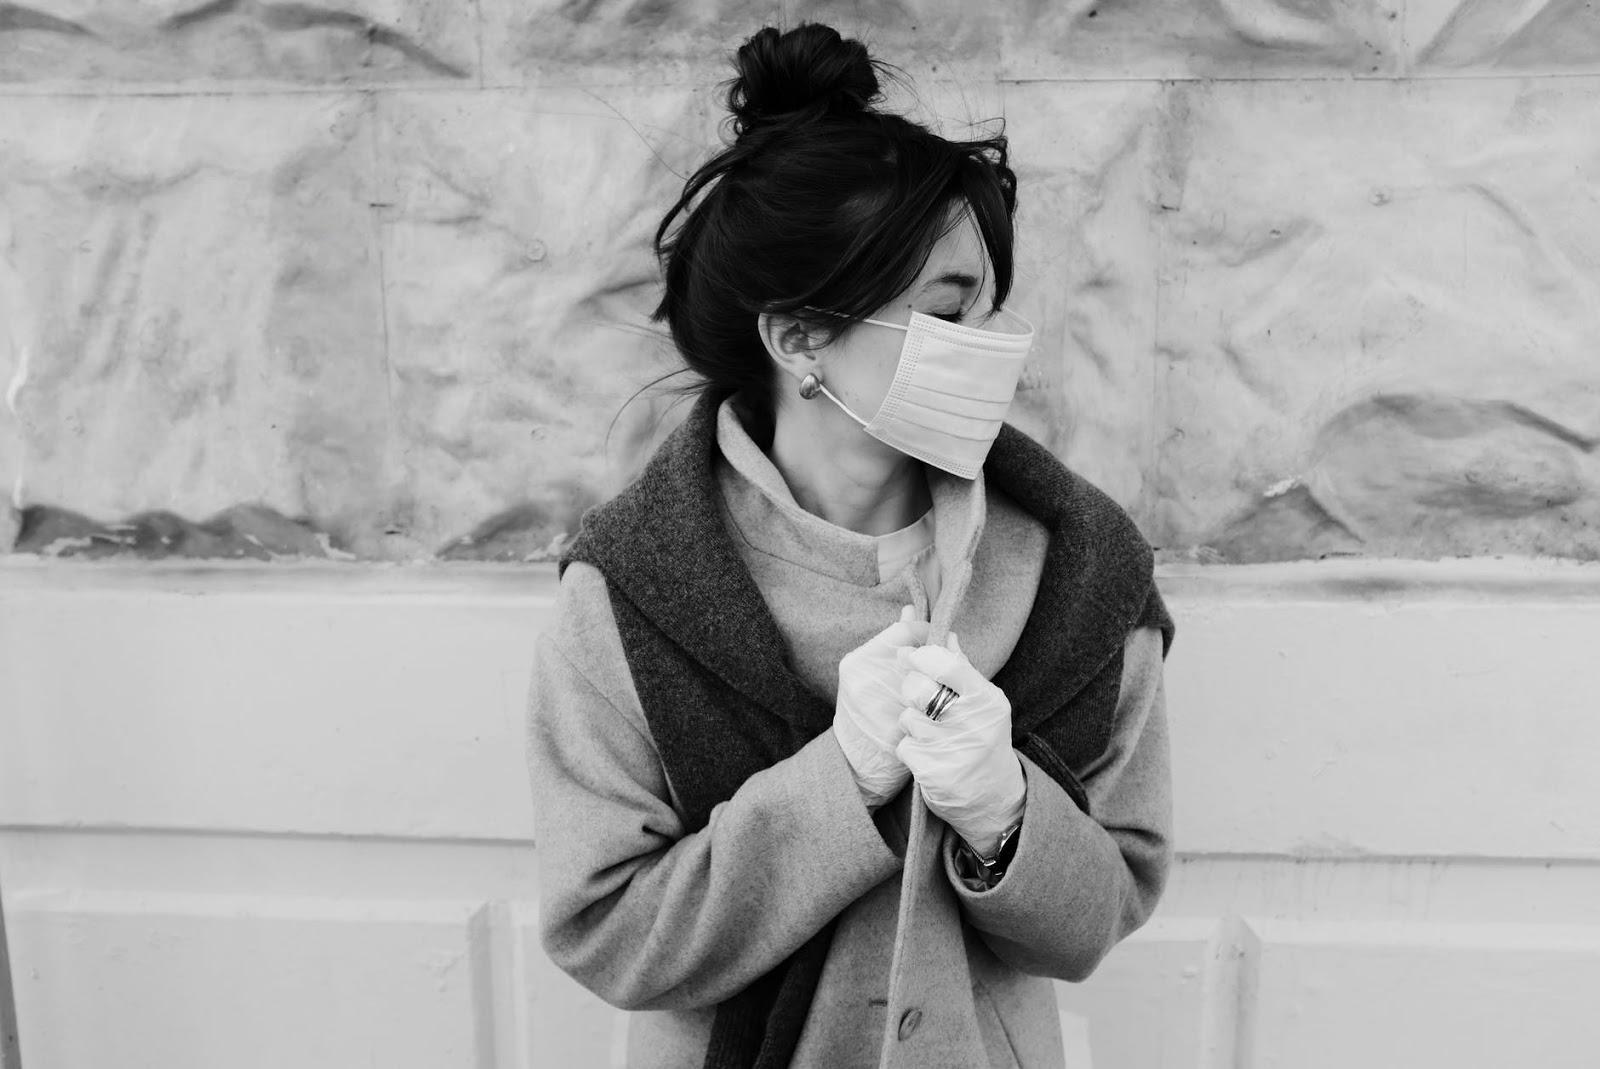 Kenali Gejala dan Ciri Jika Terinfeksi Virus Corona